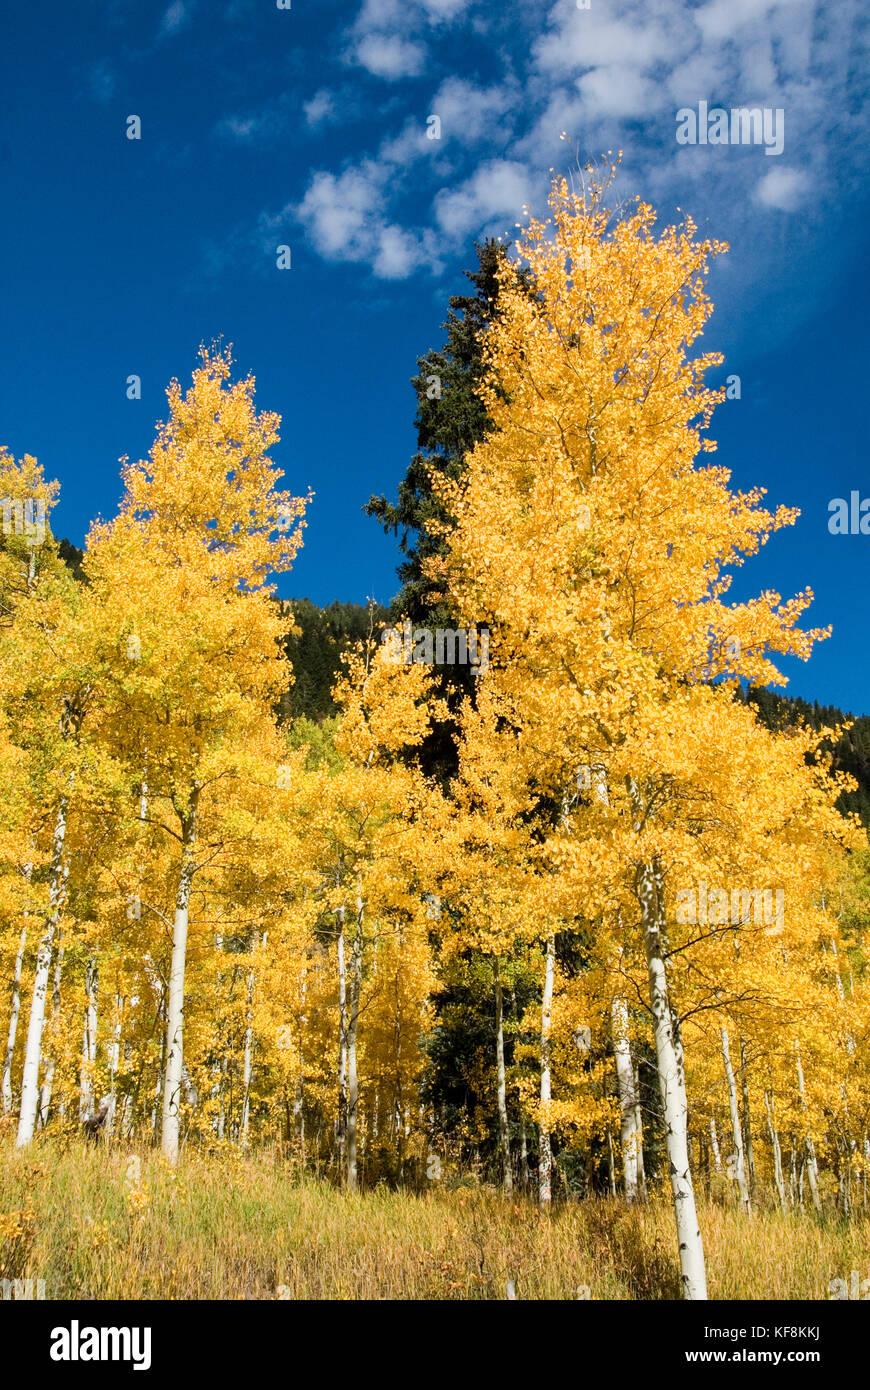 COLORFUL YELLOW FALL ASPENS - Stock Image